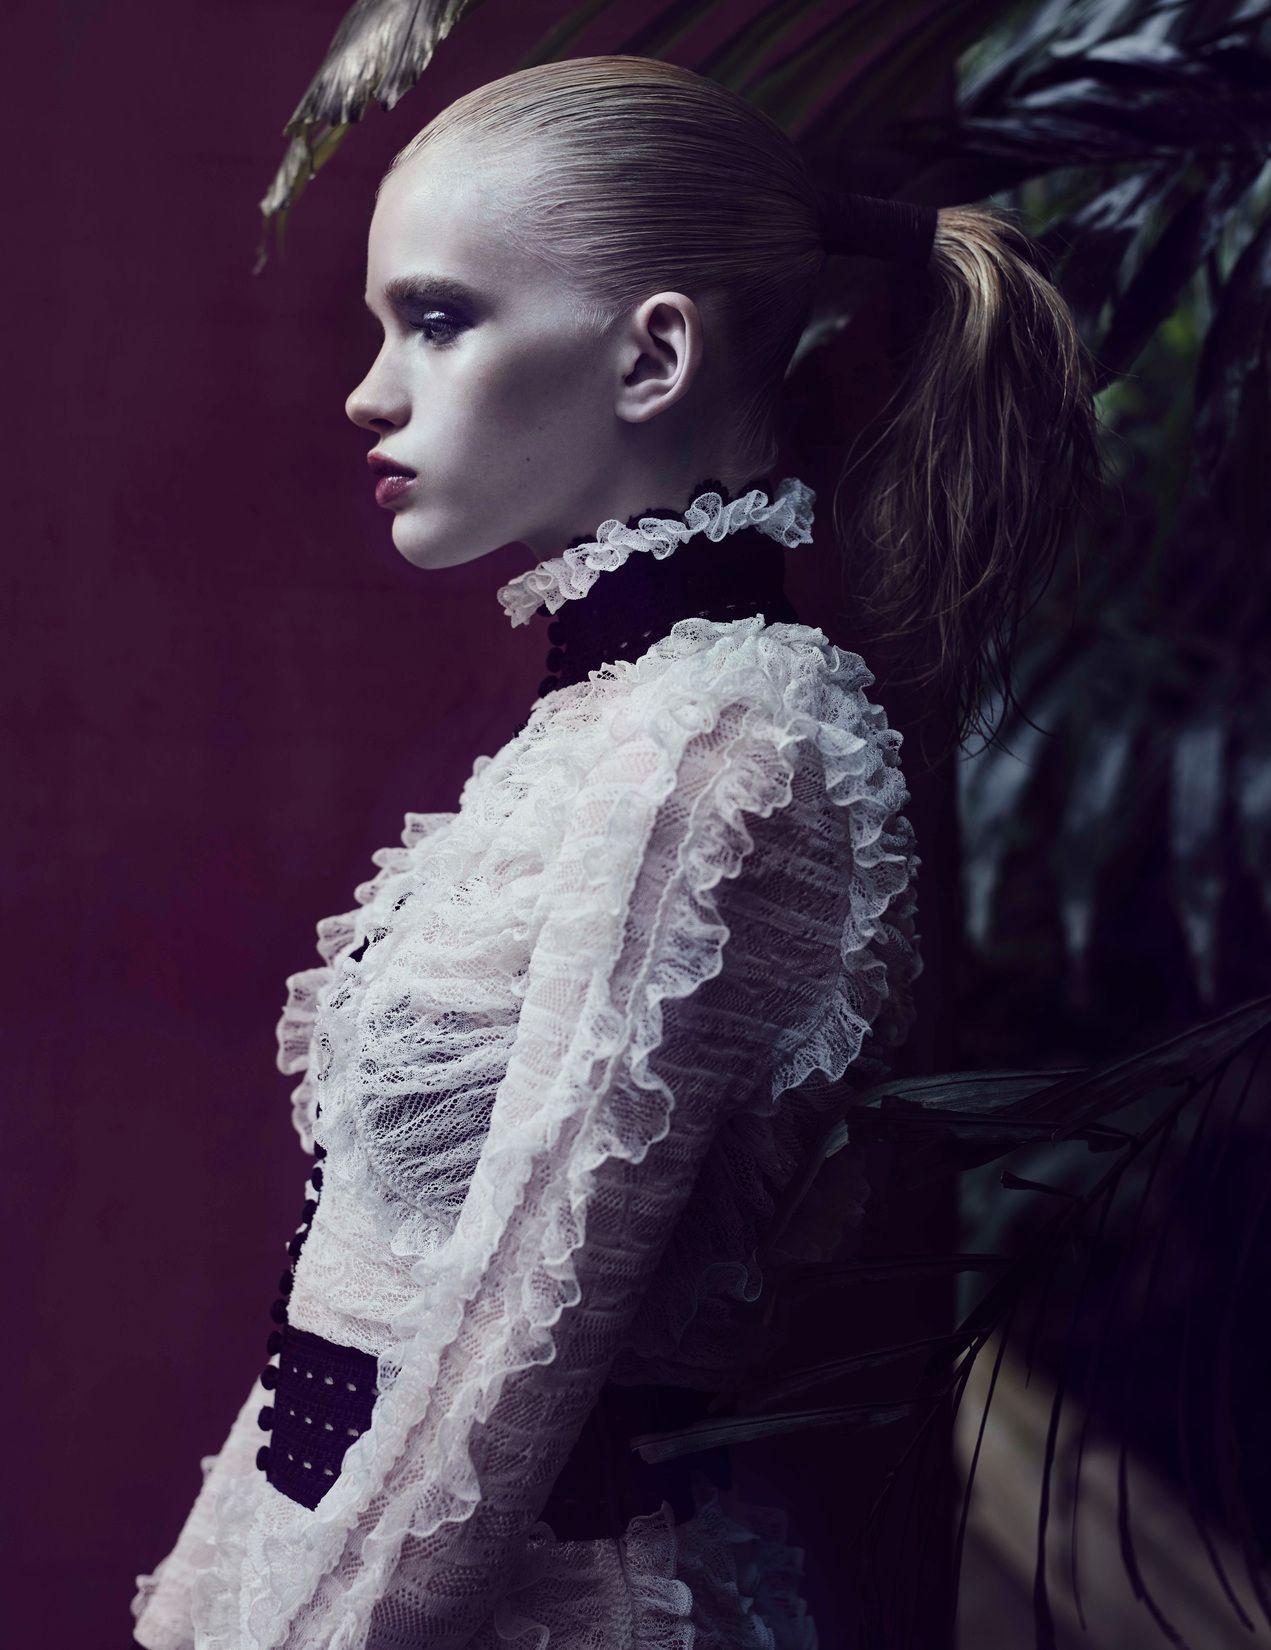 Stella Lucia for LOVE Magazine FW15 Sølve Sundsbø HAIR: SYD HAYES MAKE UP: HIROMI UEDA